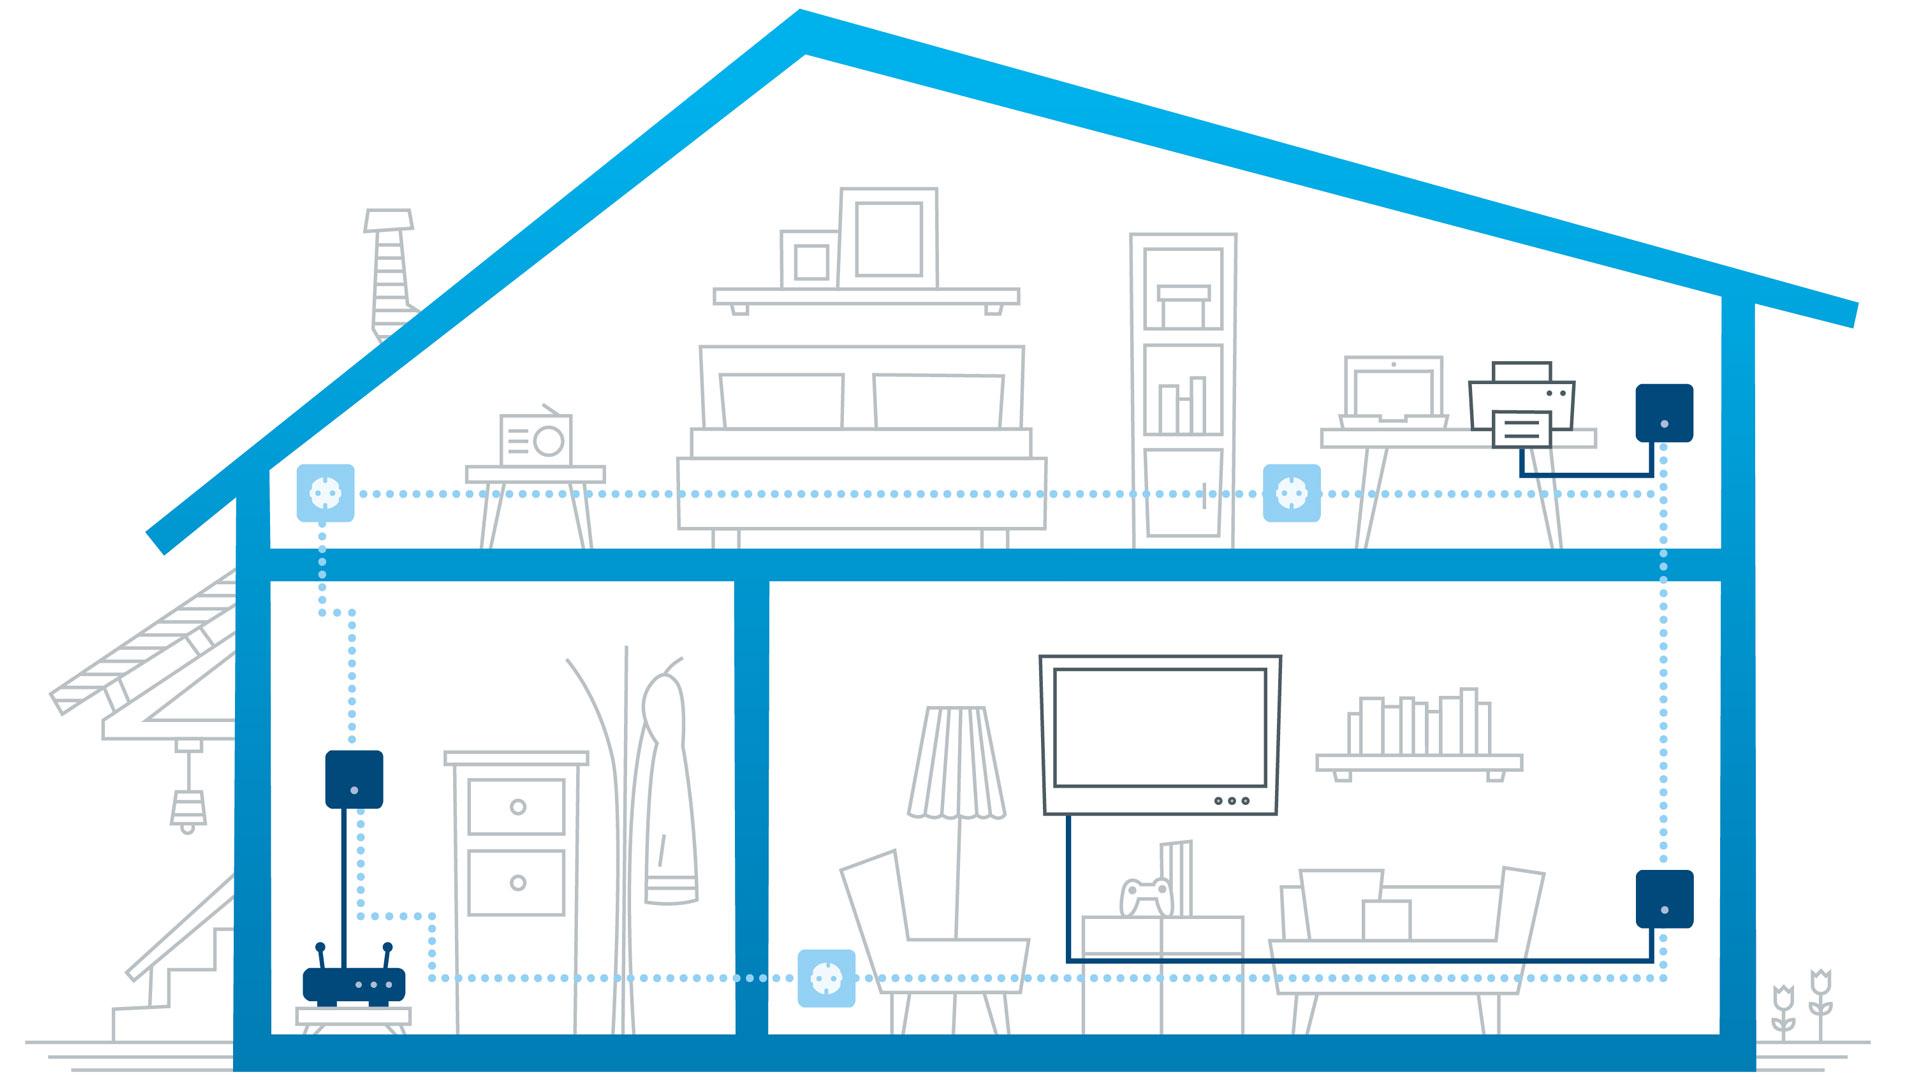 devolo dlan 1000 mini kompakter powerline adapter allround. Black Bedroom Furniture Sets. Home Design Ideas